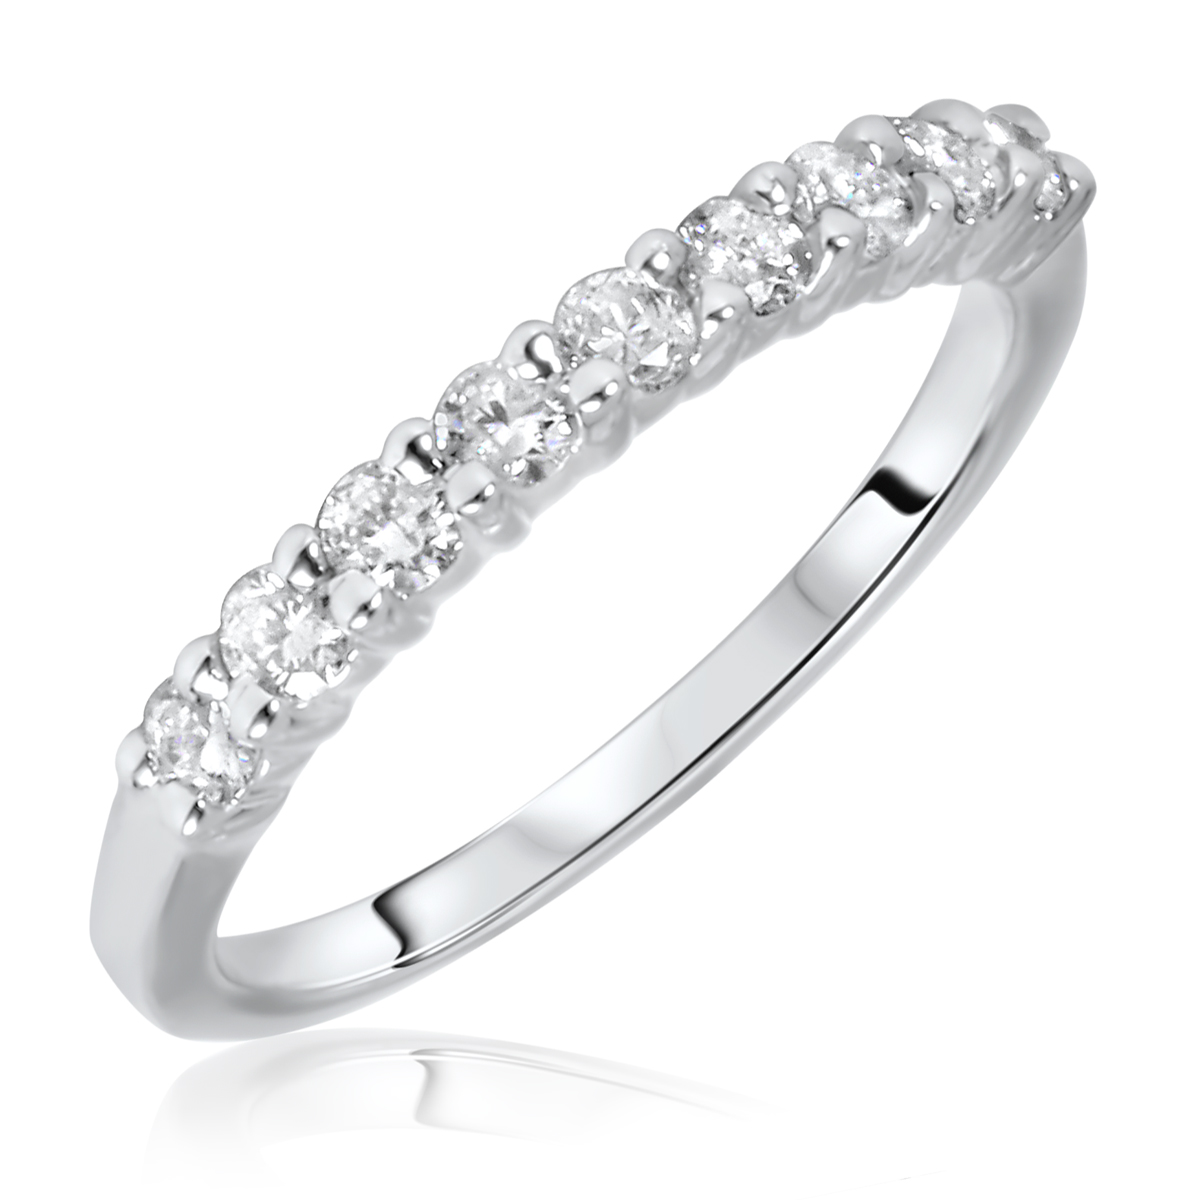 1/2 Carat T.W. Round Cut 9 Stone Diamond Anniversary Ladies Band 14K White Gold-